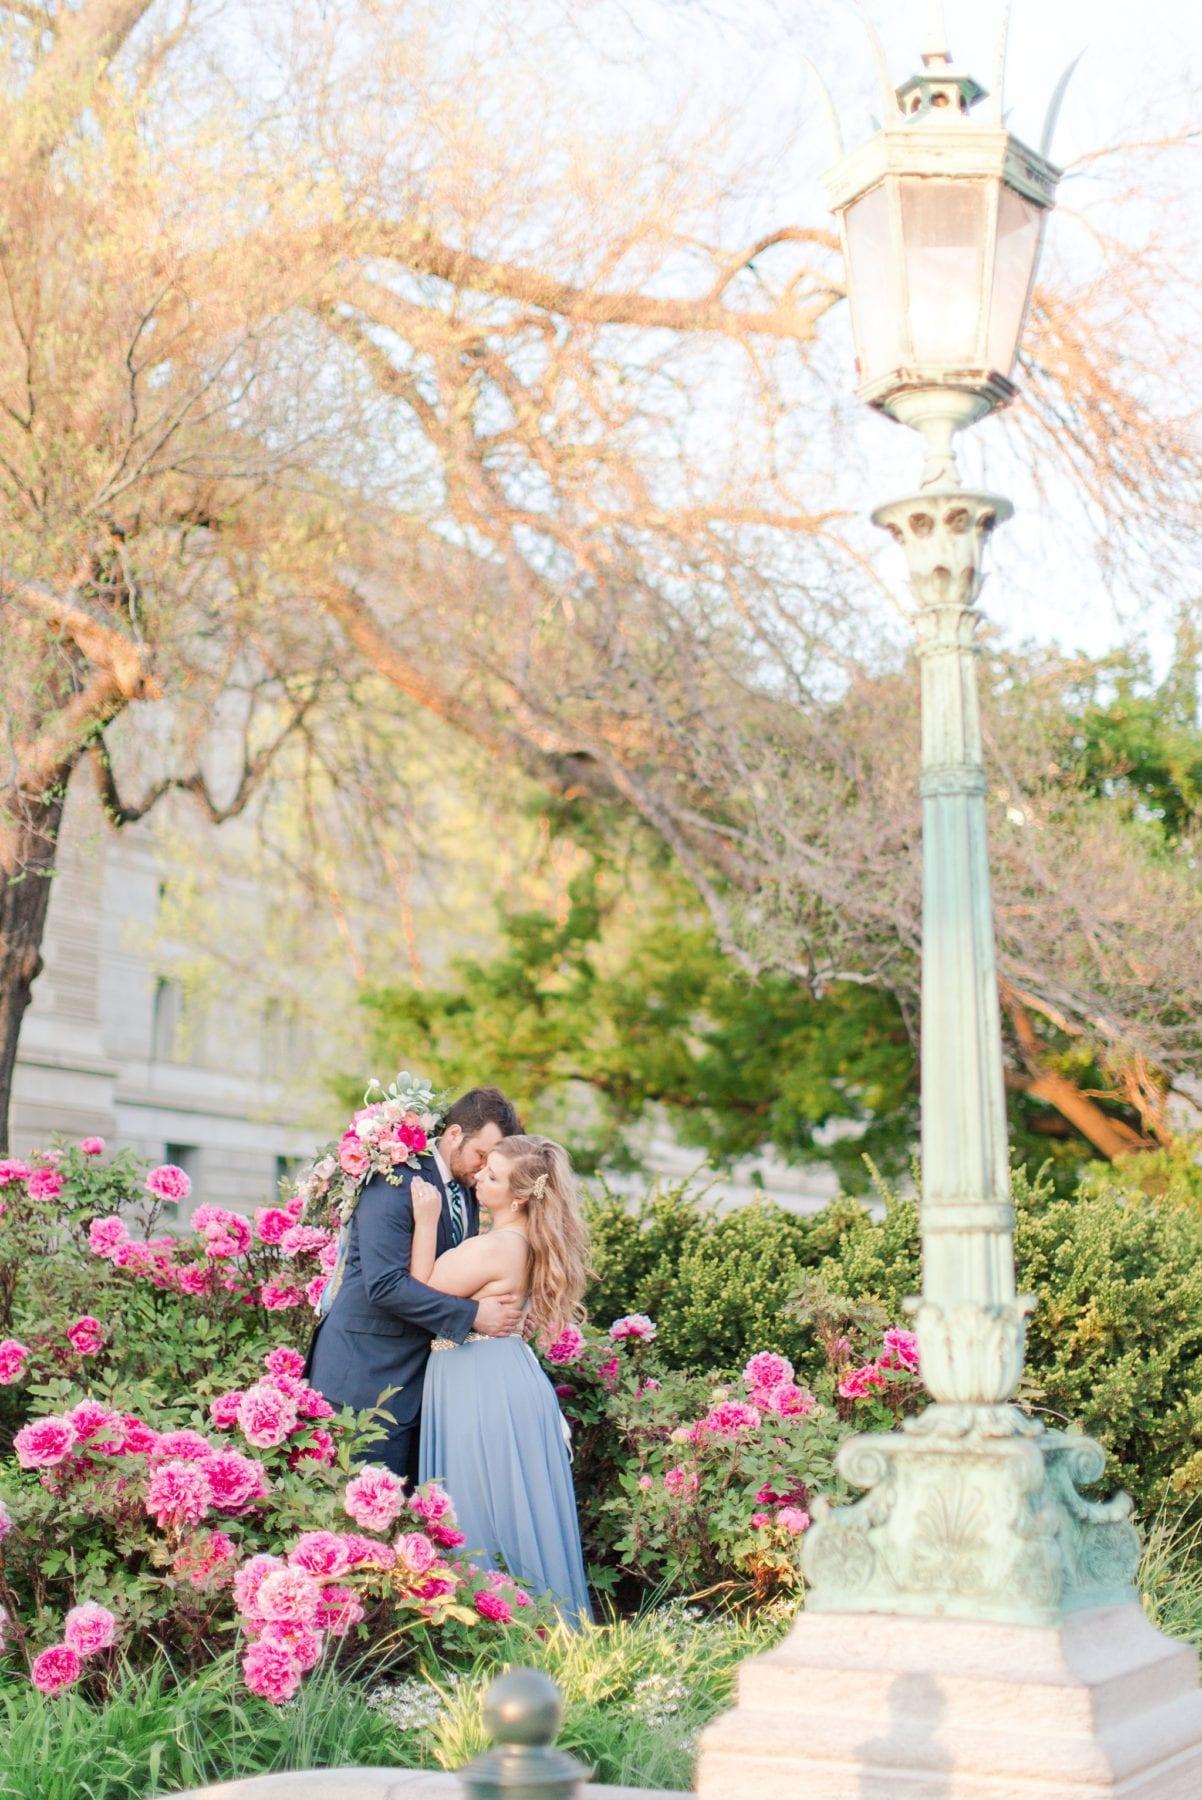 Capitol Hill Engagement Photos Kelly & Zach Washington DC Wedding Photographer Megan Kelsey Photography-253.jpg